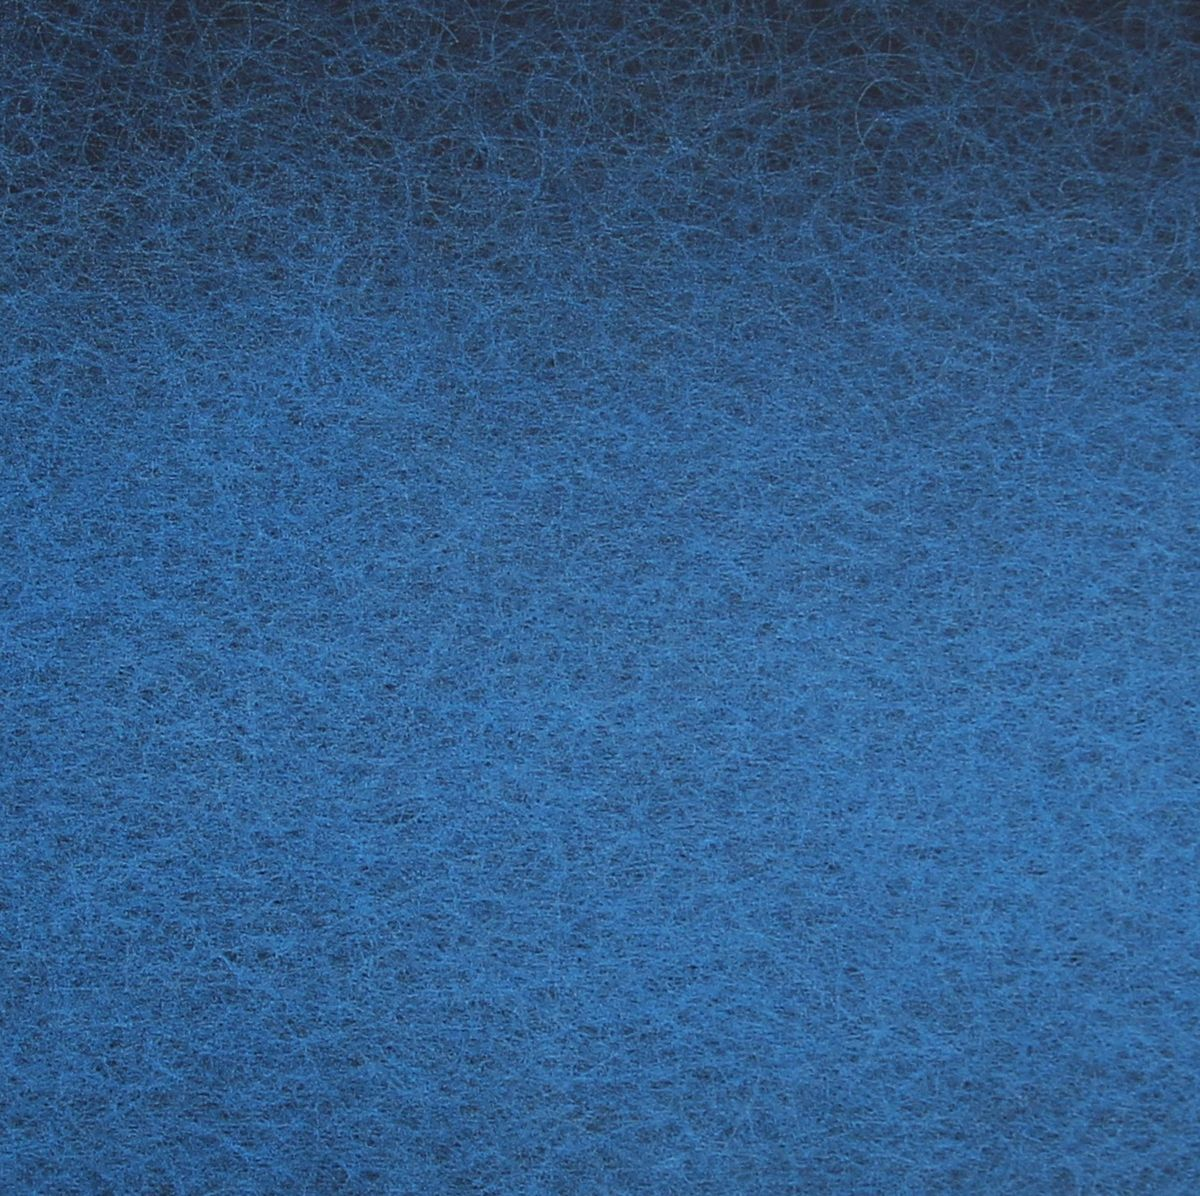 Quantum Entanglement (Phthalo Blue 2 detail)